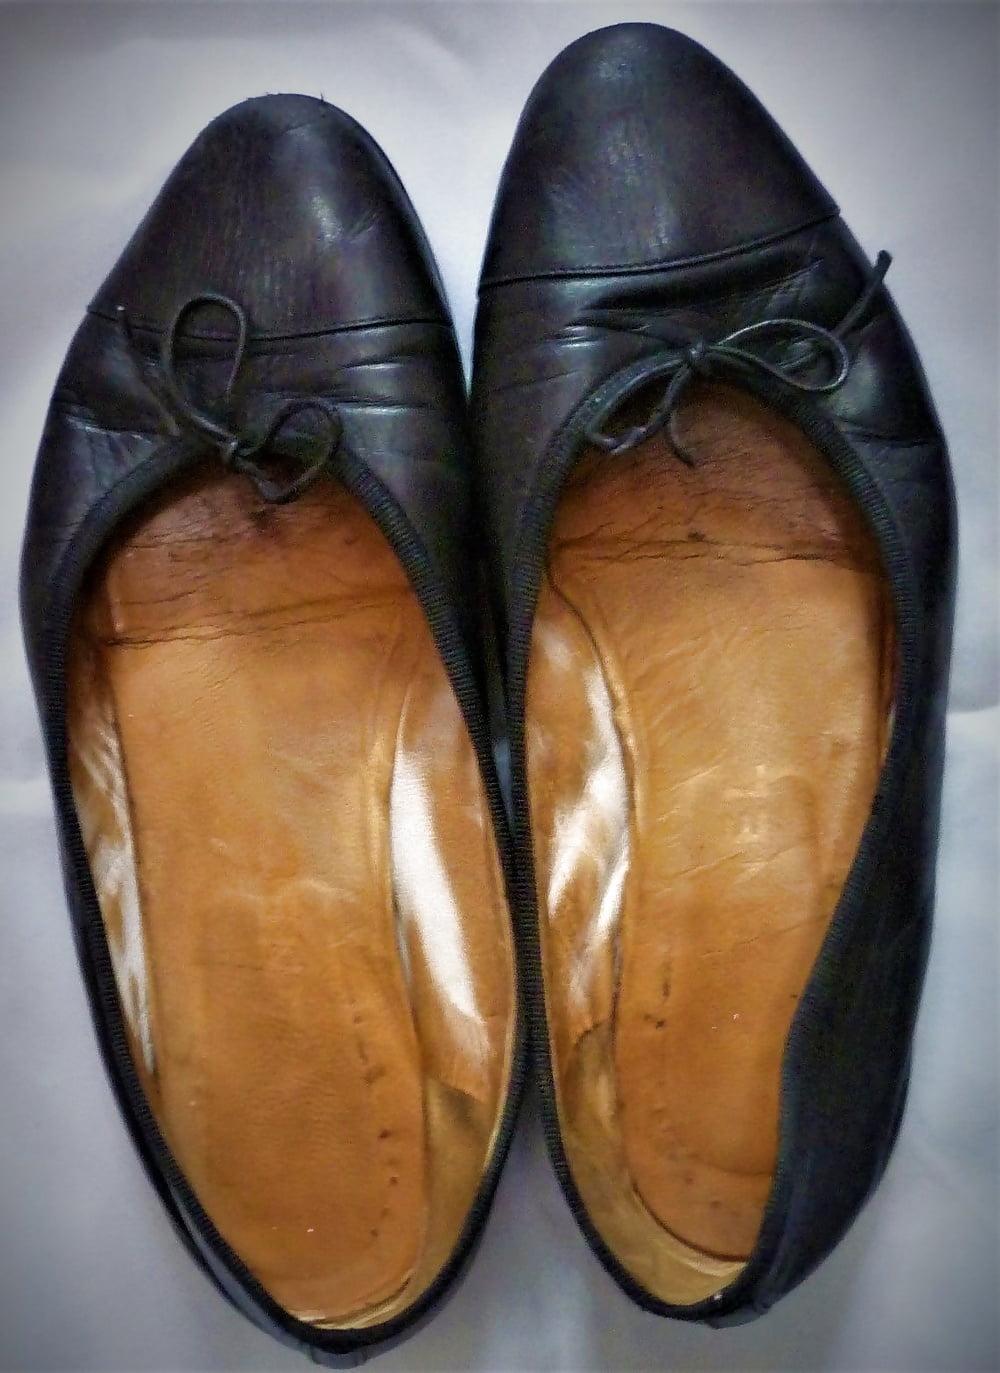 Stacy well worn reebok sneakers sole shoeplay full vid - 5 7